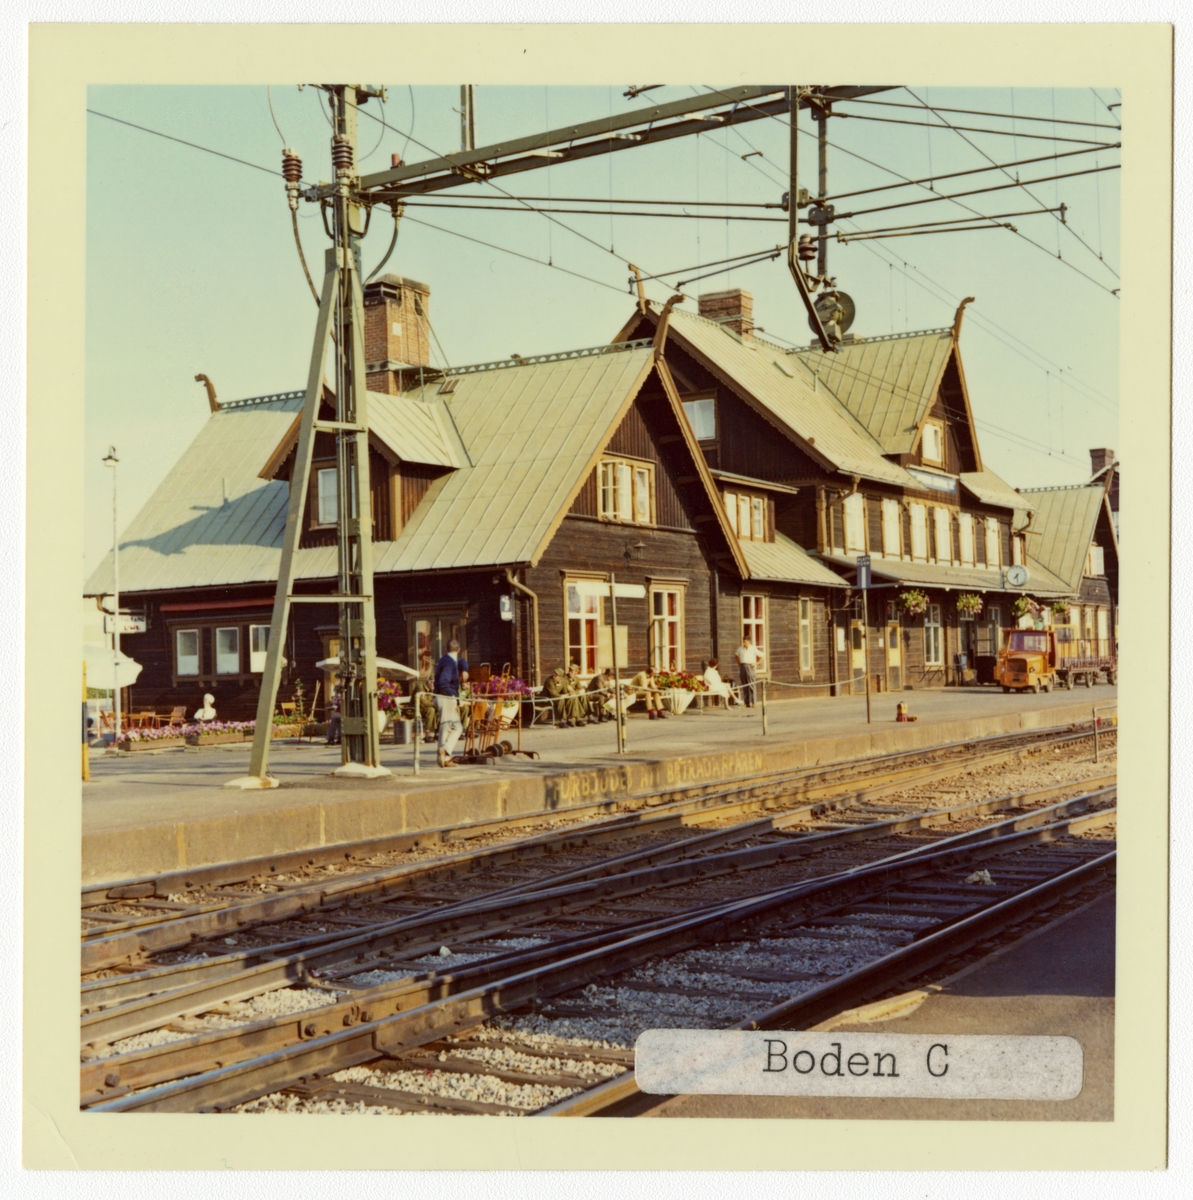 Stationen kallad BODEN CENTRAL 1926-05-15 - 1981-05-31. S&NJ, Sverige & Norge Järnväg